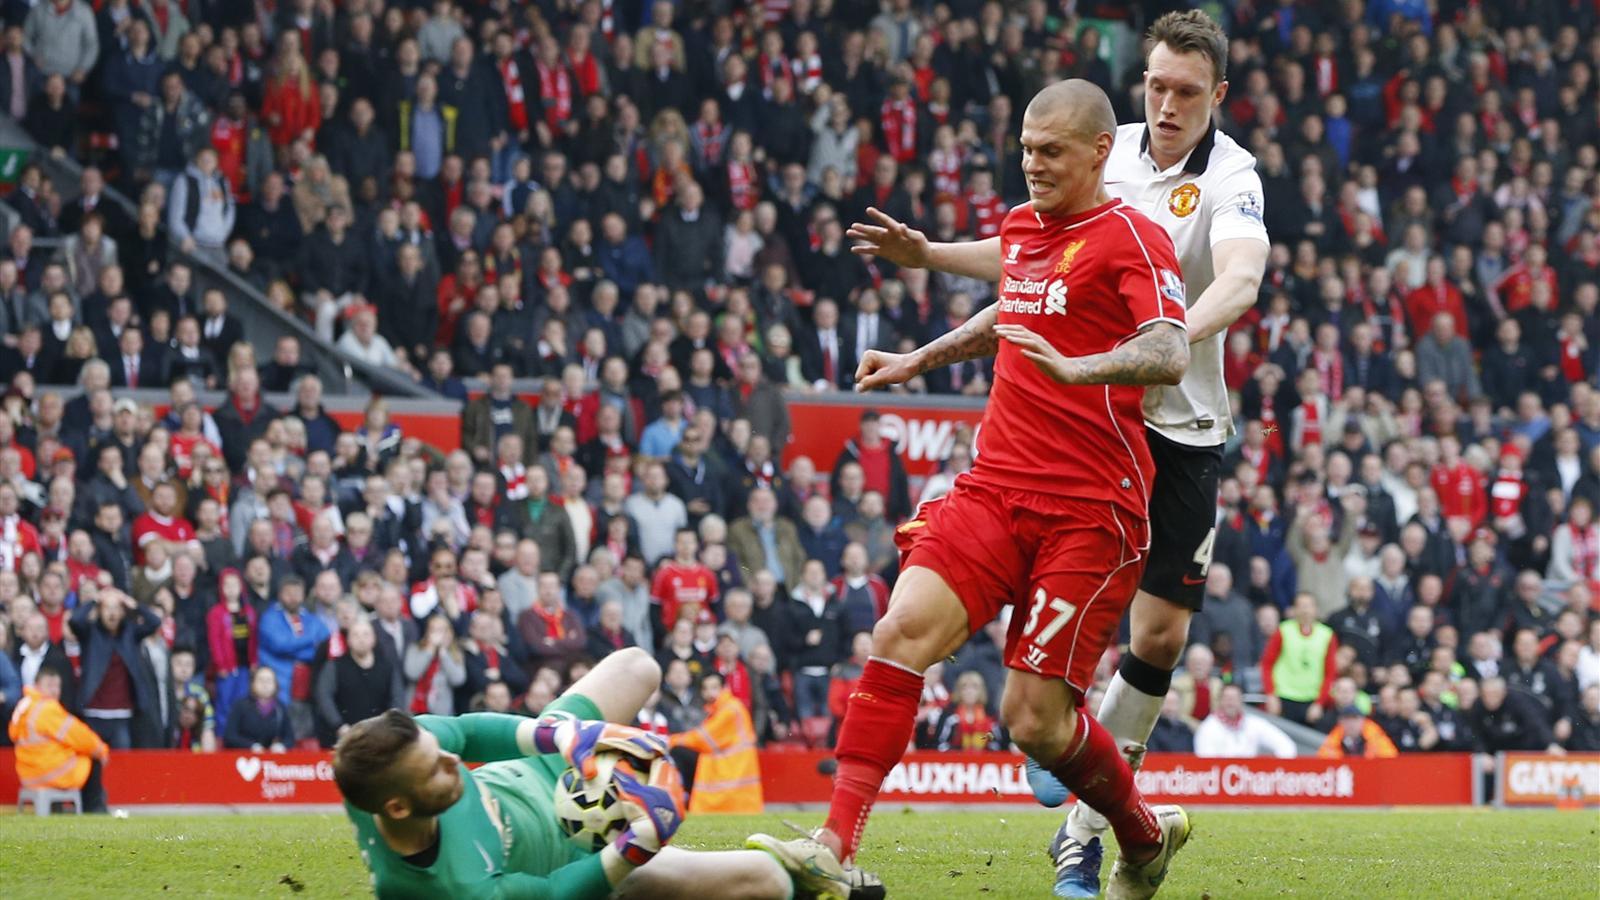 Liverpool's Martin Skrtel challenges Manchester United's David De Gea (Reuters)